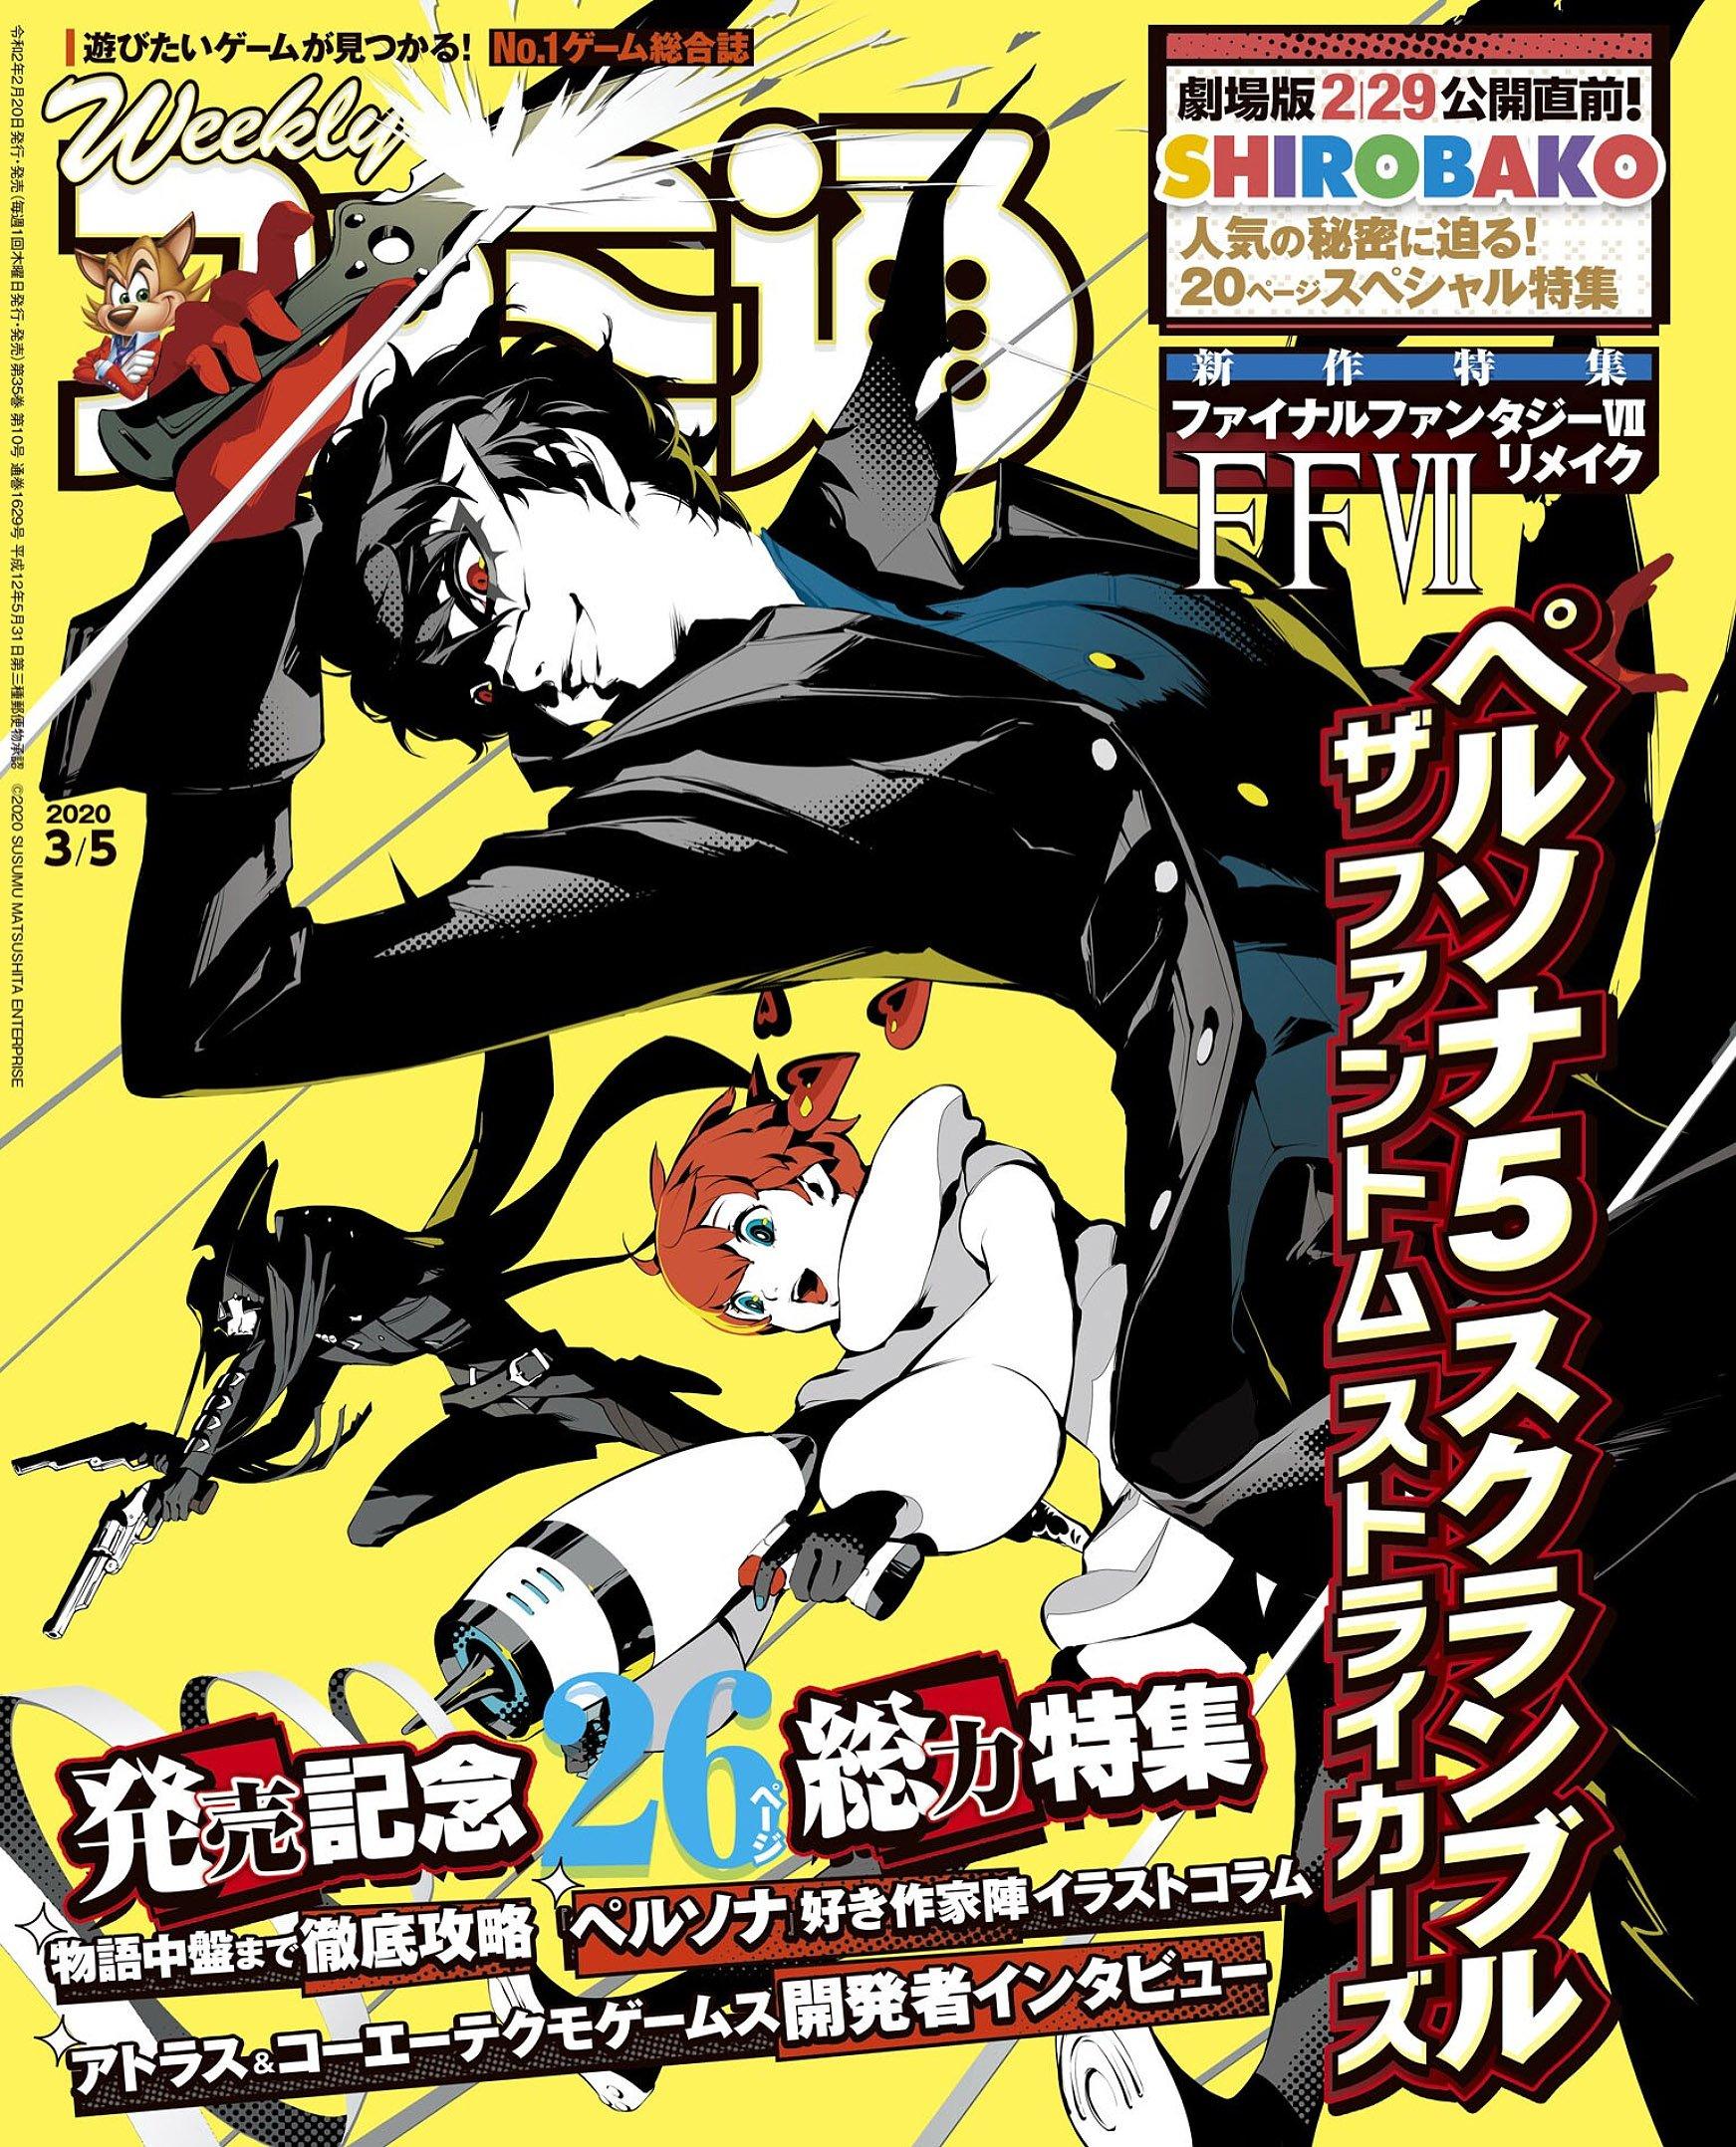 Famitsu 1629 (March 5, 2020)